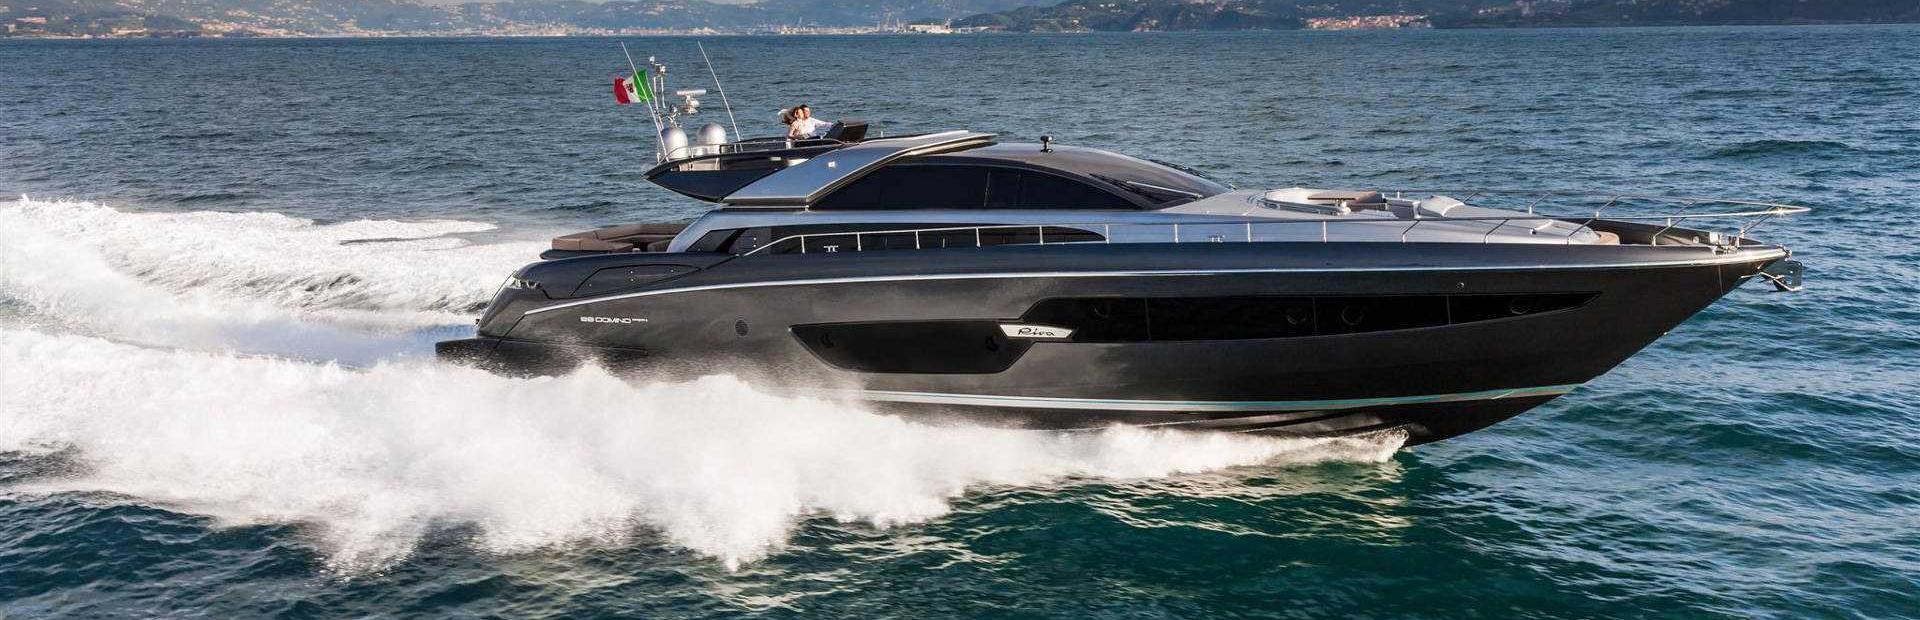 88' Domino Super Yacht Charter